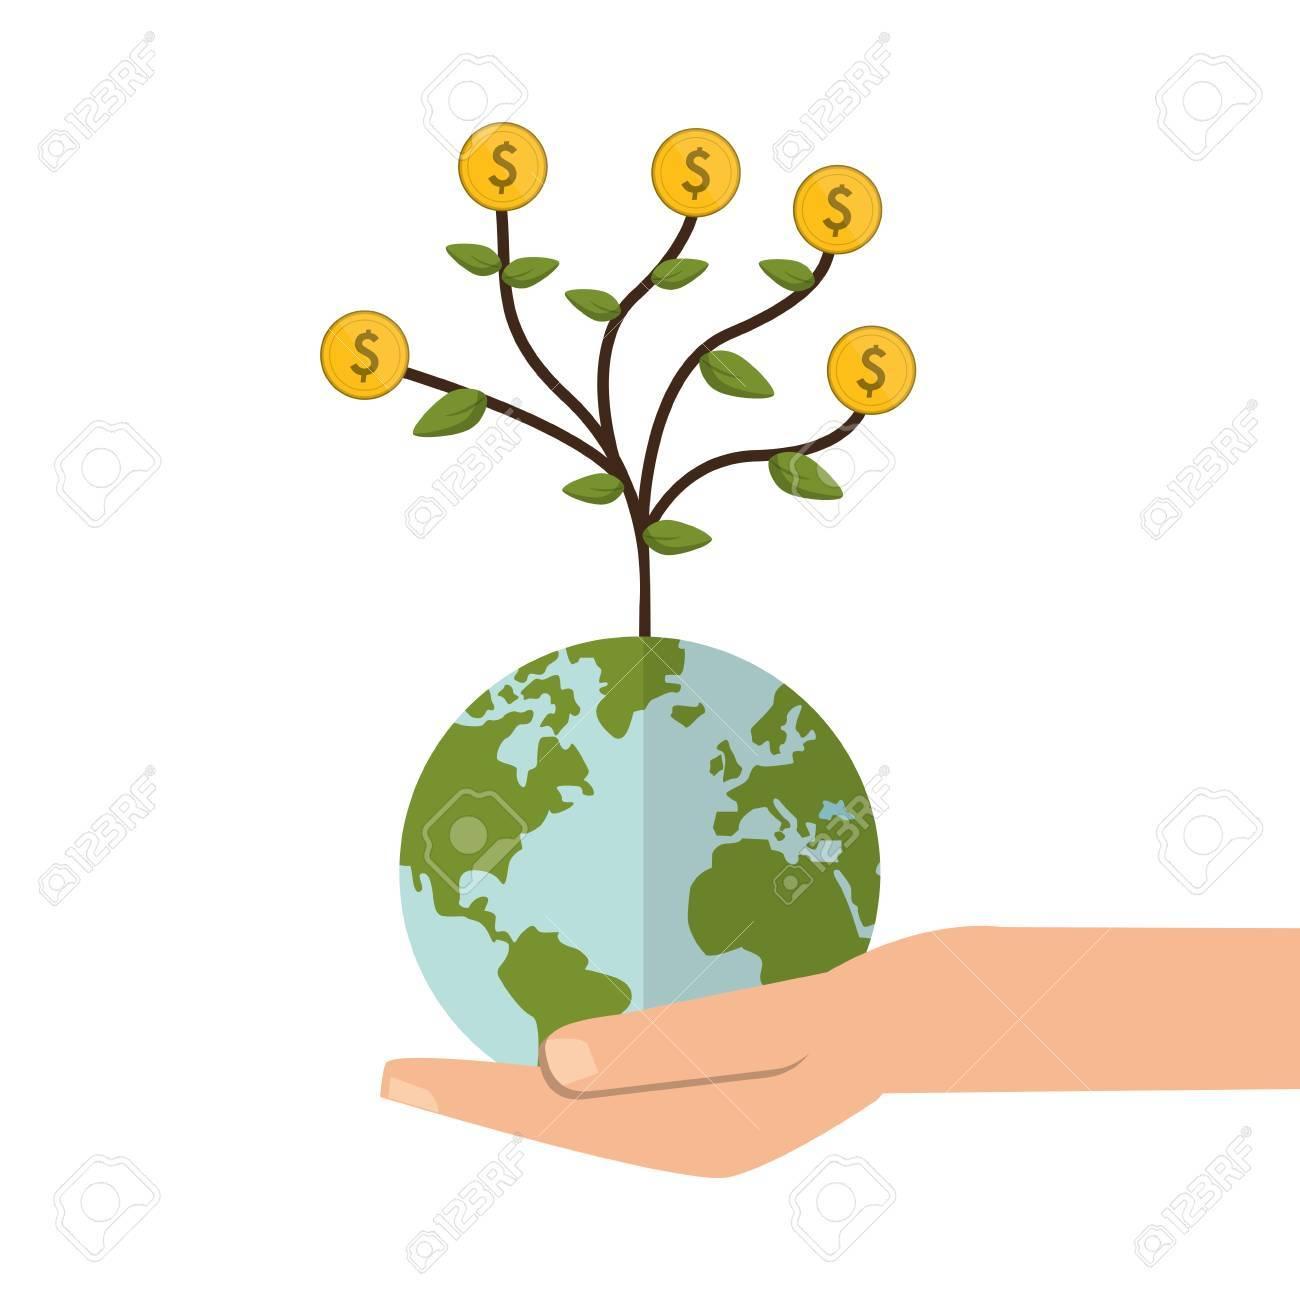 flat design shelter hand with earth globe money tree icon vector rh 123rf com Money Bag Clip Art Stacks of Money Clip Art